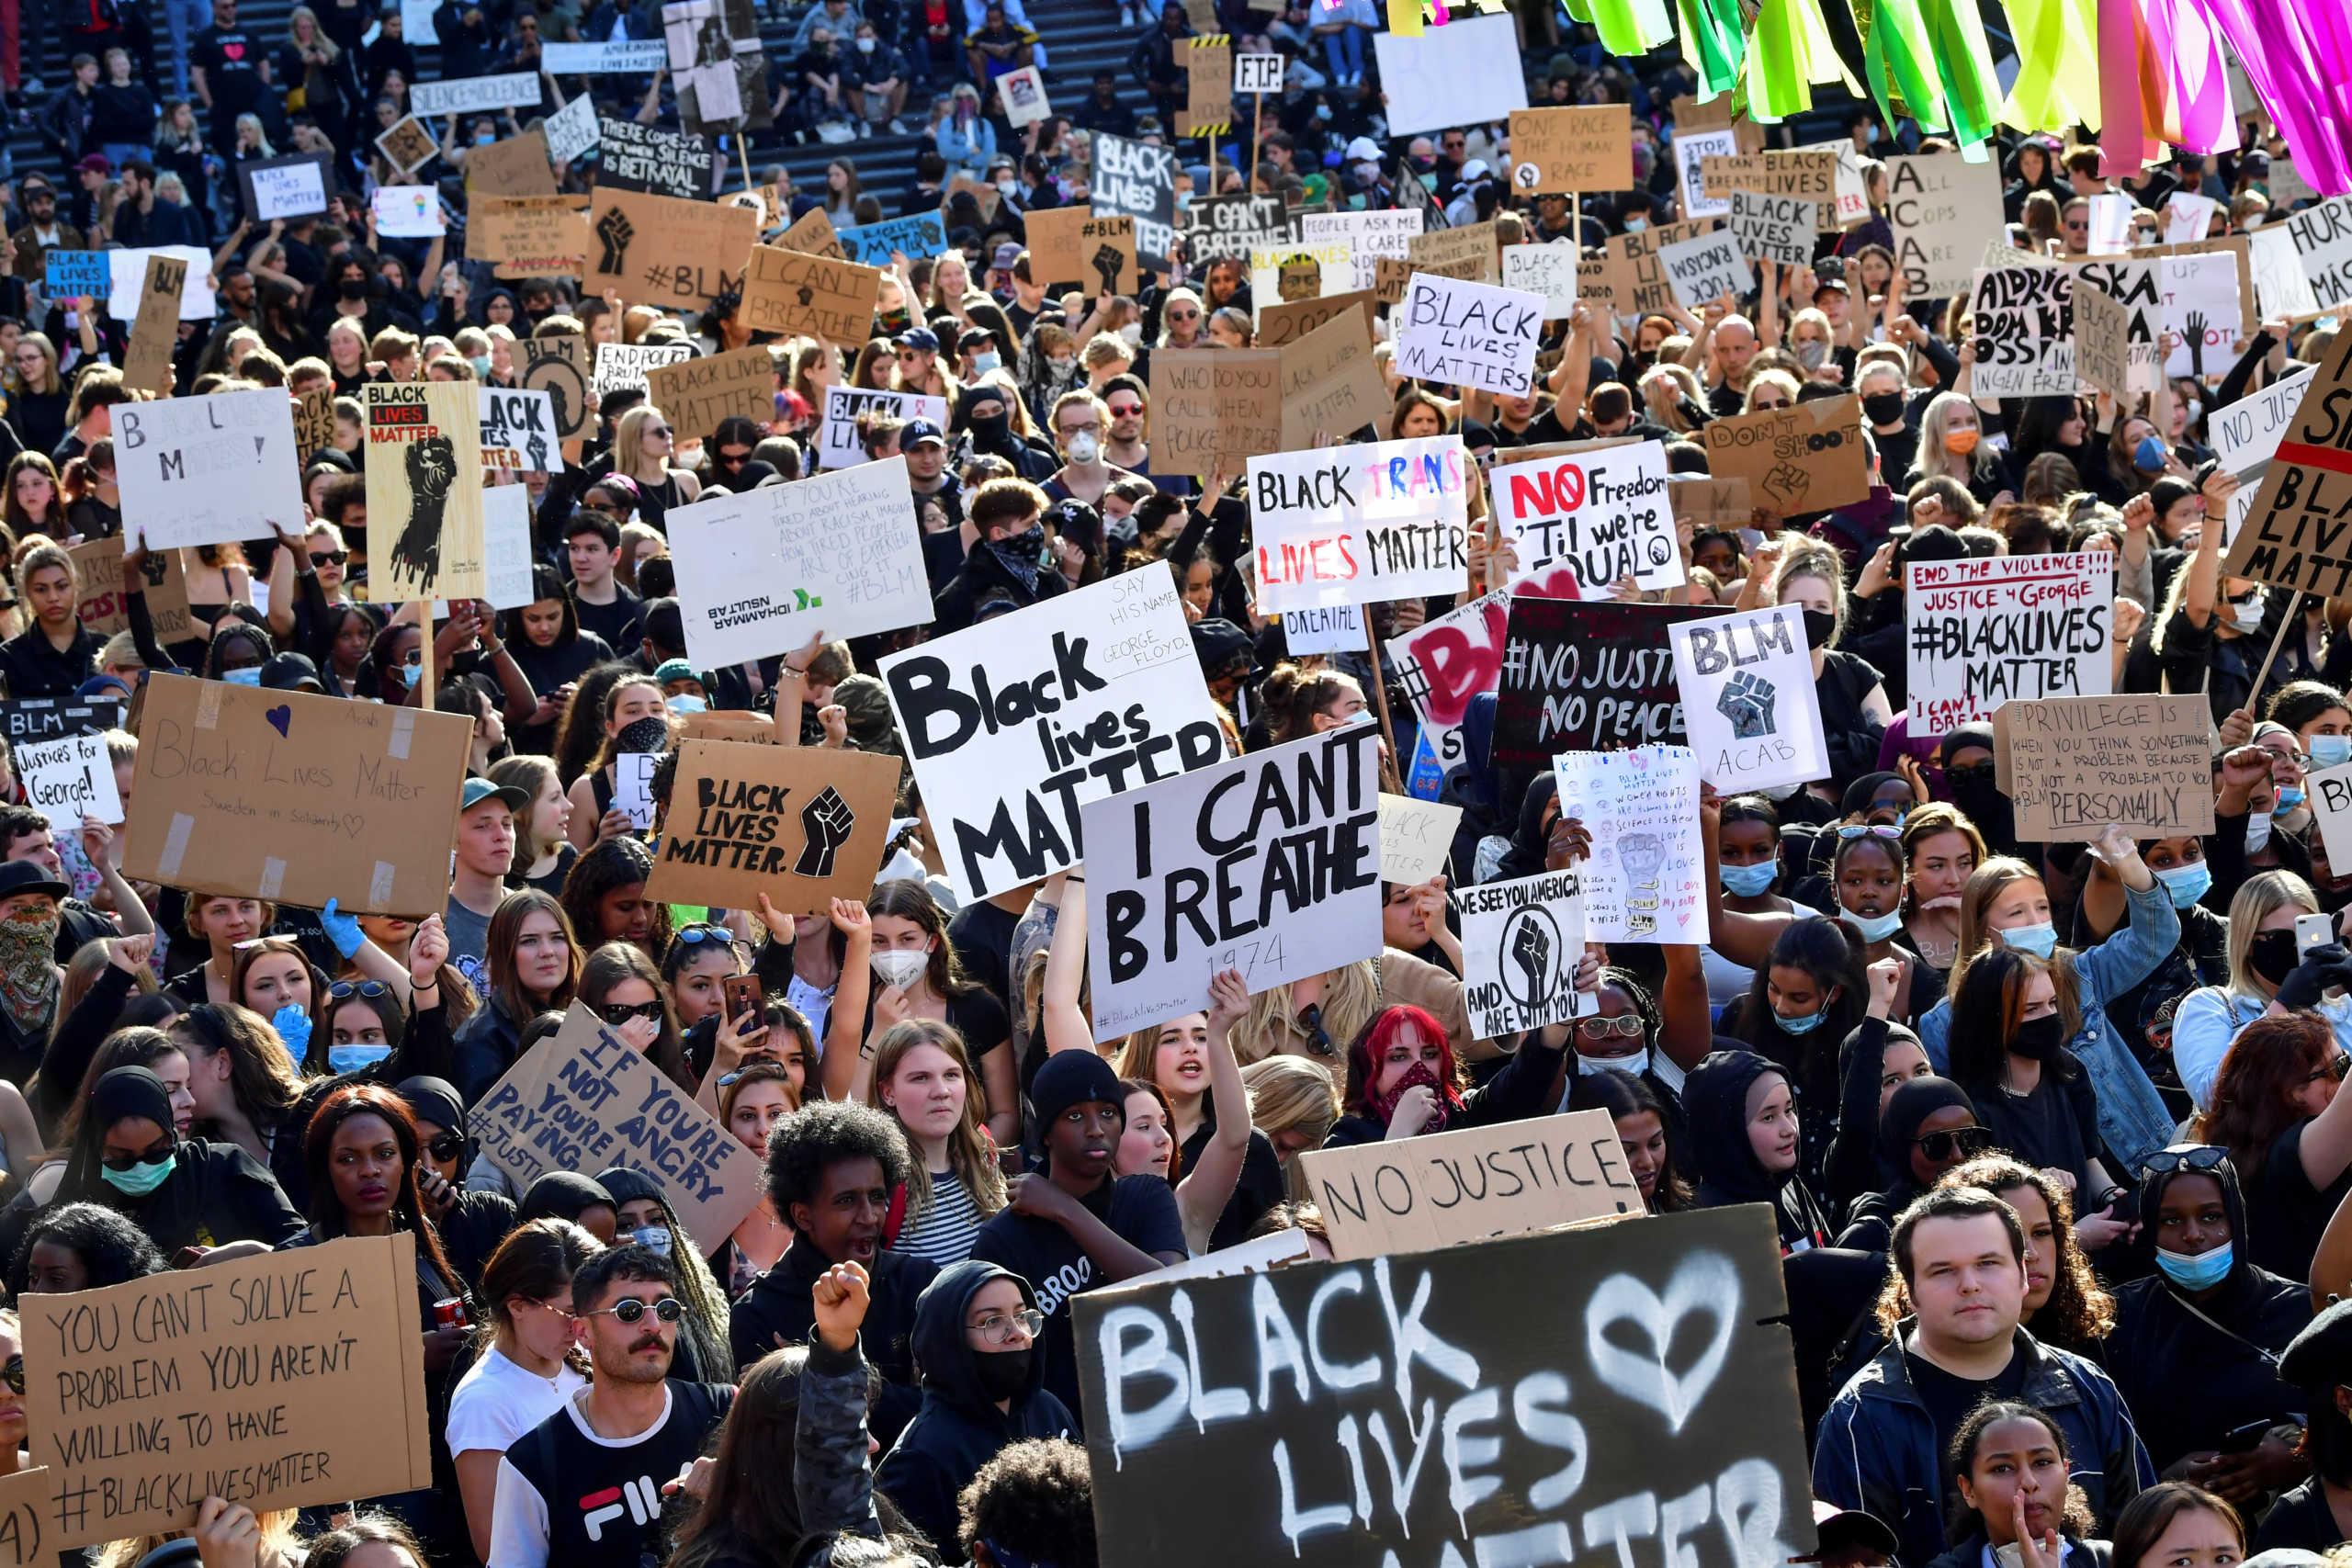 Black Lives Matter: Βουλευτής πρότεινε για Νόμπελ Ειρήνης 2021 το αντιρατσιστικό κίνημα